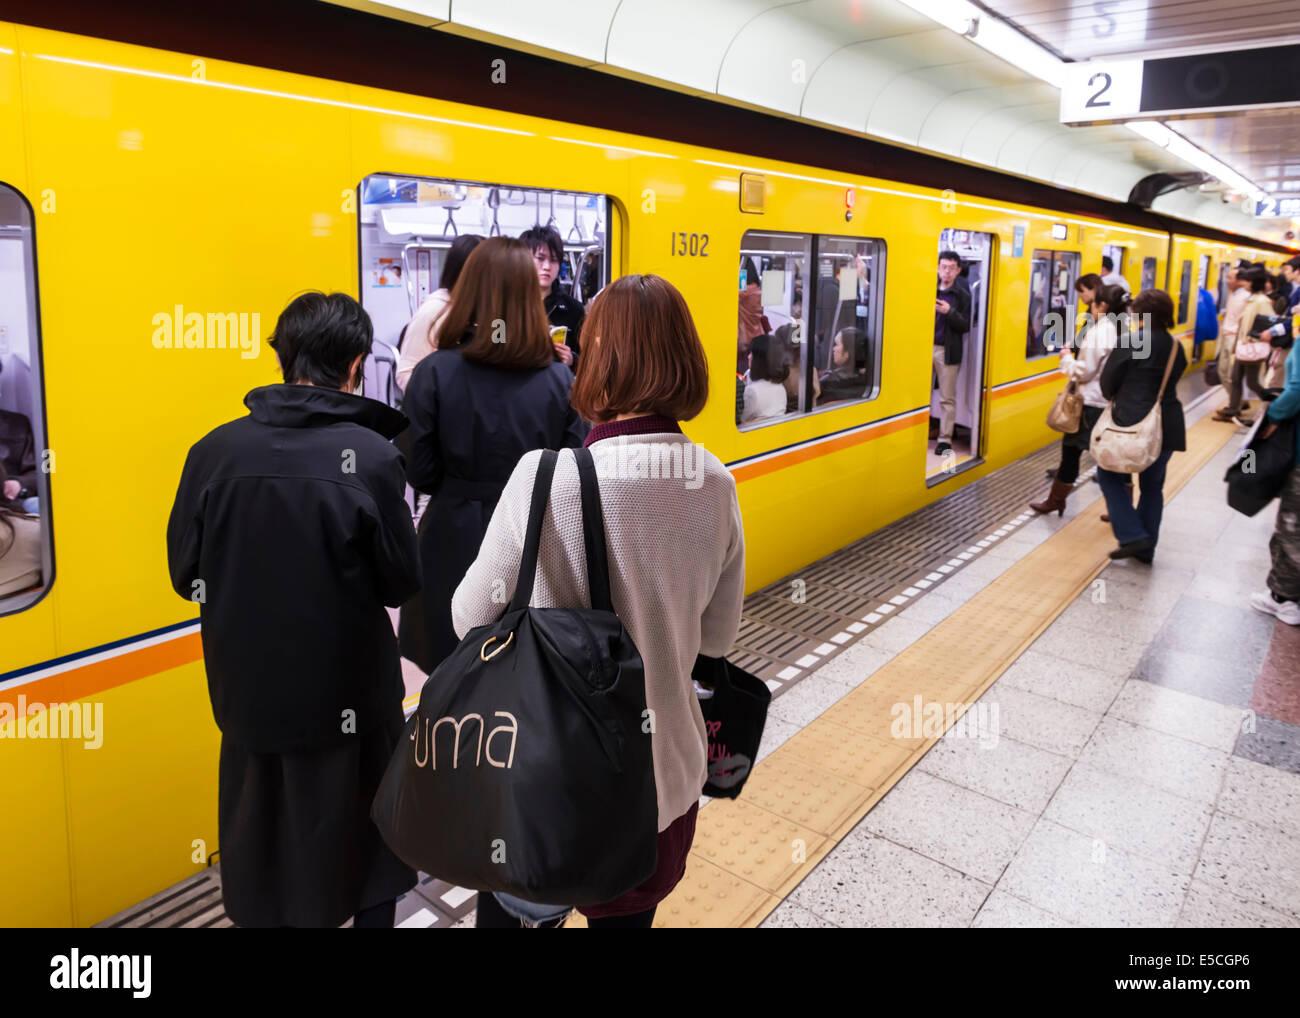 People at a subway station platform entering a train. Tokyo Metro, Tokyo, Japan. Stock Photo